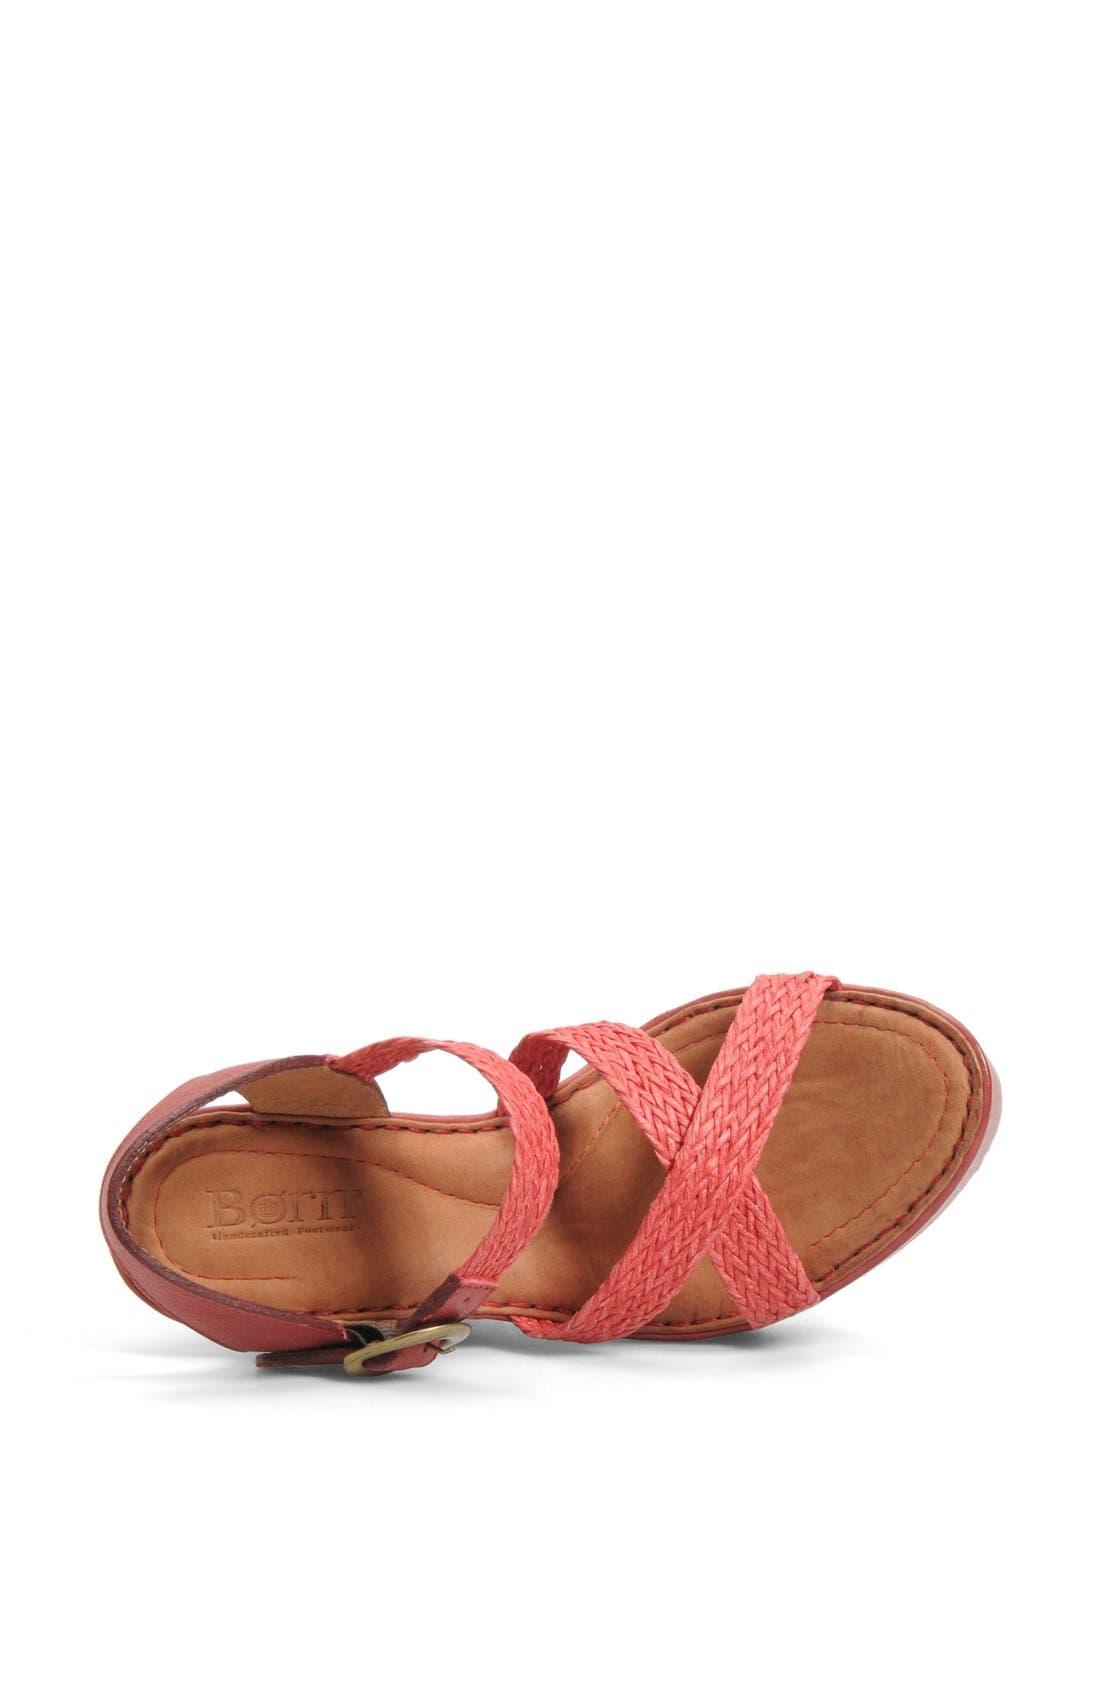 Alternate Image 3  - Børn 'Estefania' Wedge Sandal